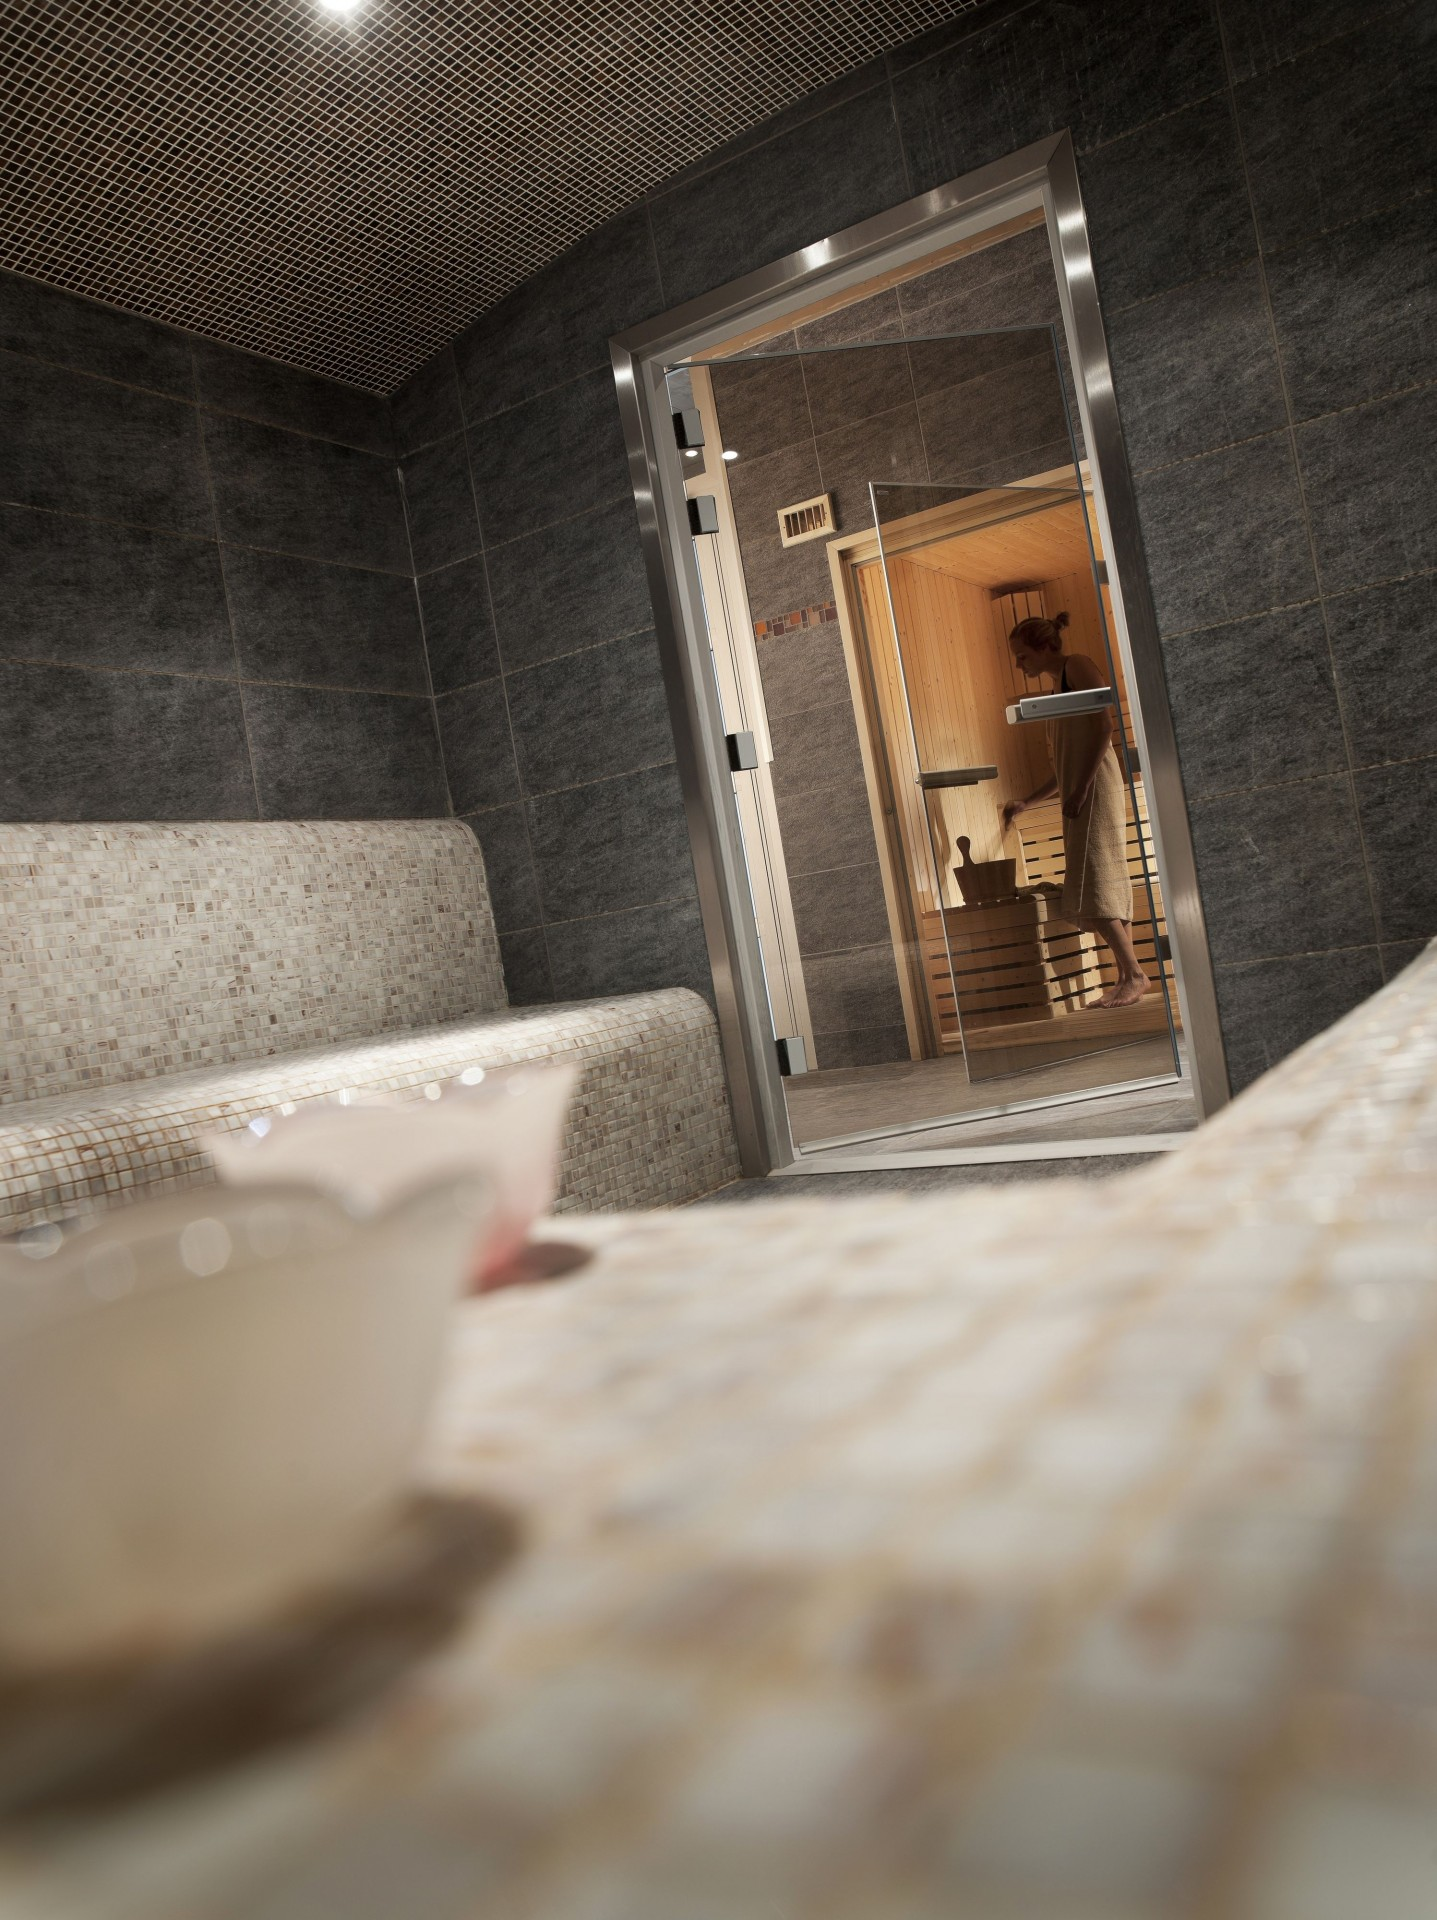 Bourg Saint Maurice Location Appartement Luxe Blodite Sauna